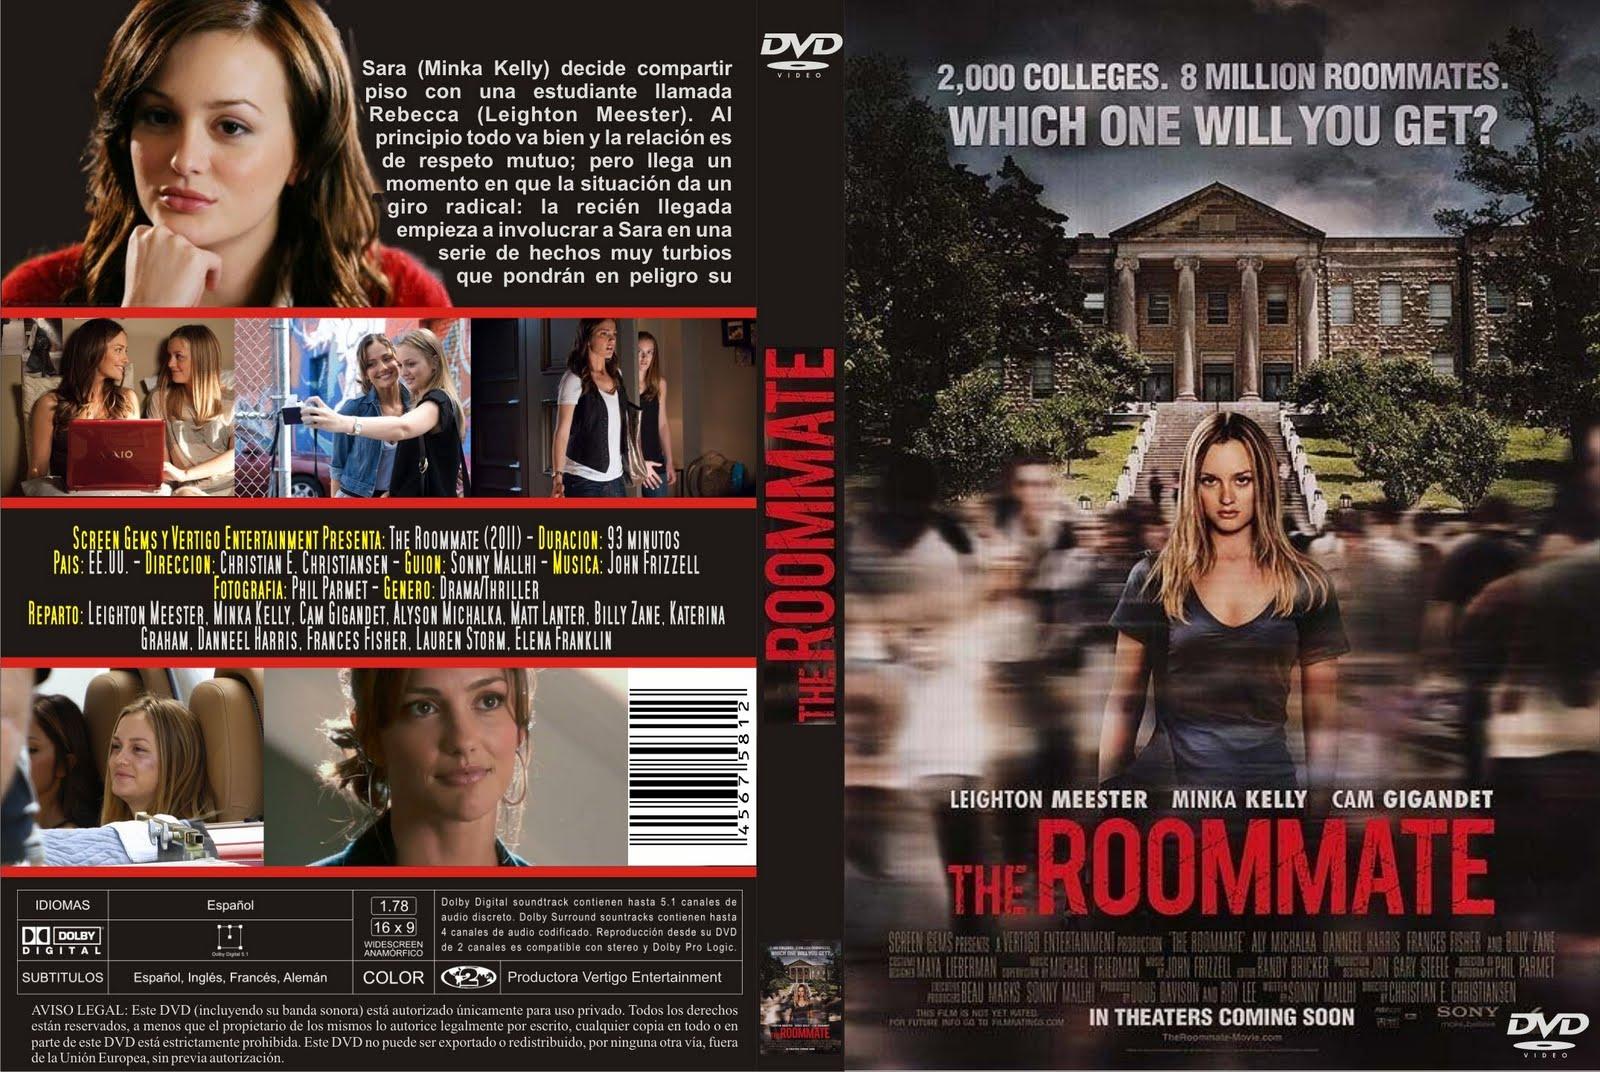 http://1.bp.blogspot.com/-bgeL1BuHLSs/TcbXVMdWVNI/AAAAAAAAACY/JDbAjLU9lt4/s1600/1854+-+The_Roommate_-_Custom_por_jonander1_%255Bdvd%255D_80.jpg